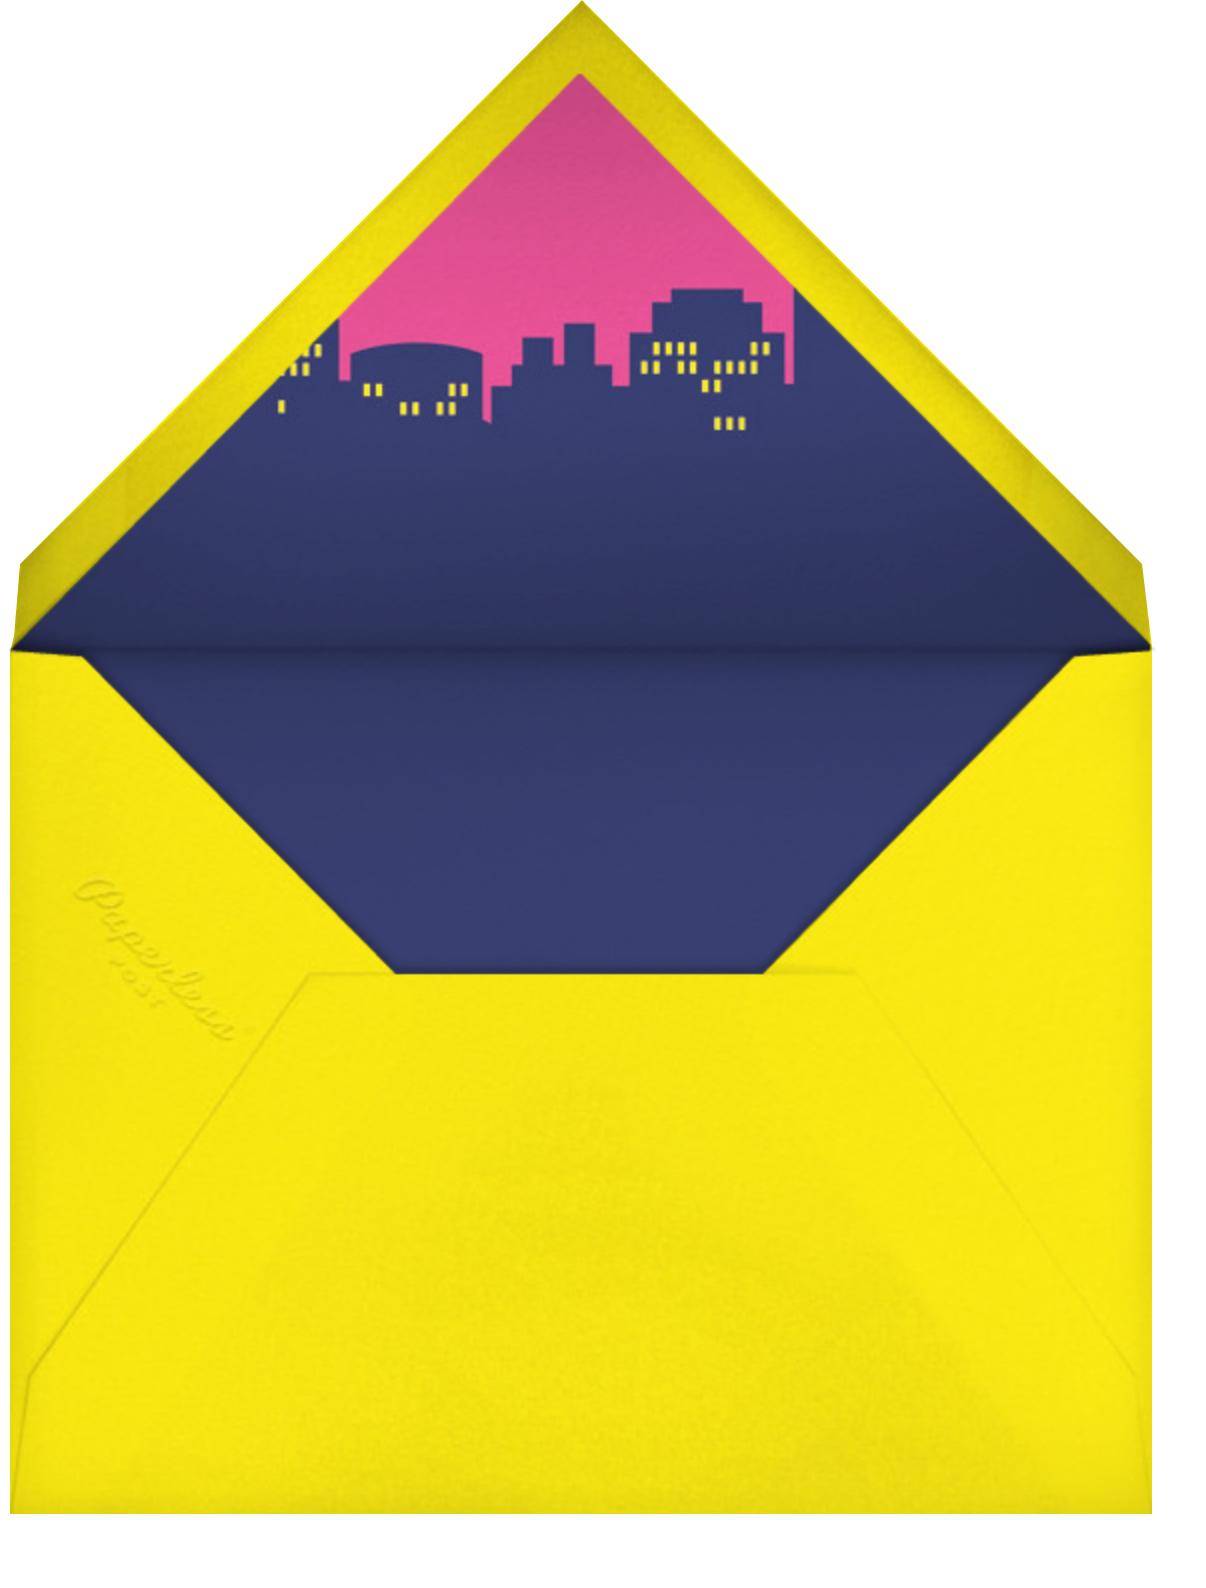 Bam Bam Pow (Photo) - Pink - Paperless Post - Envelope